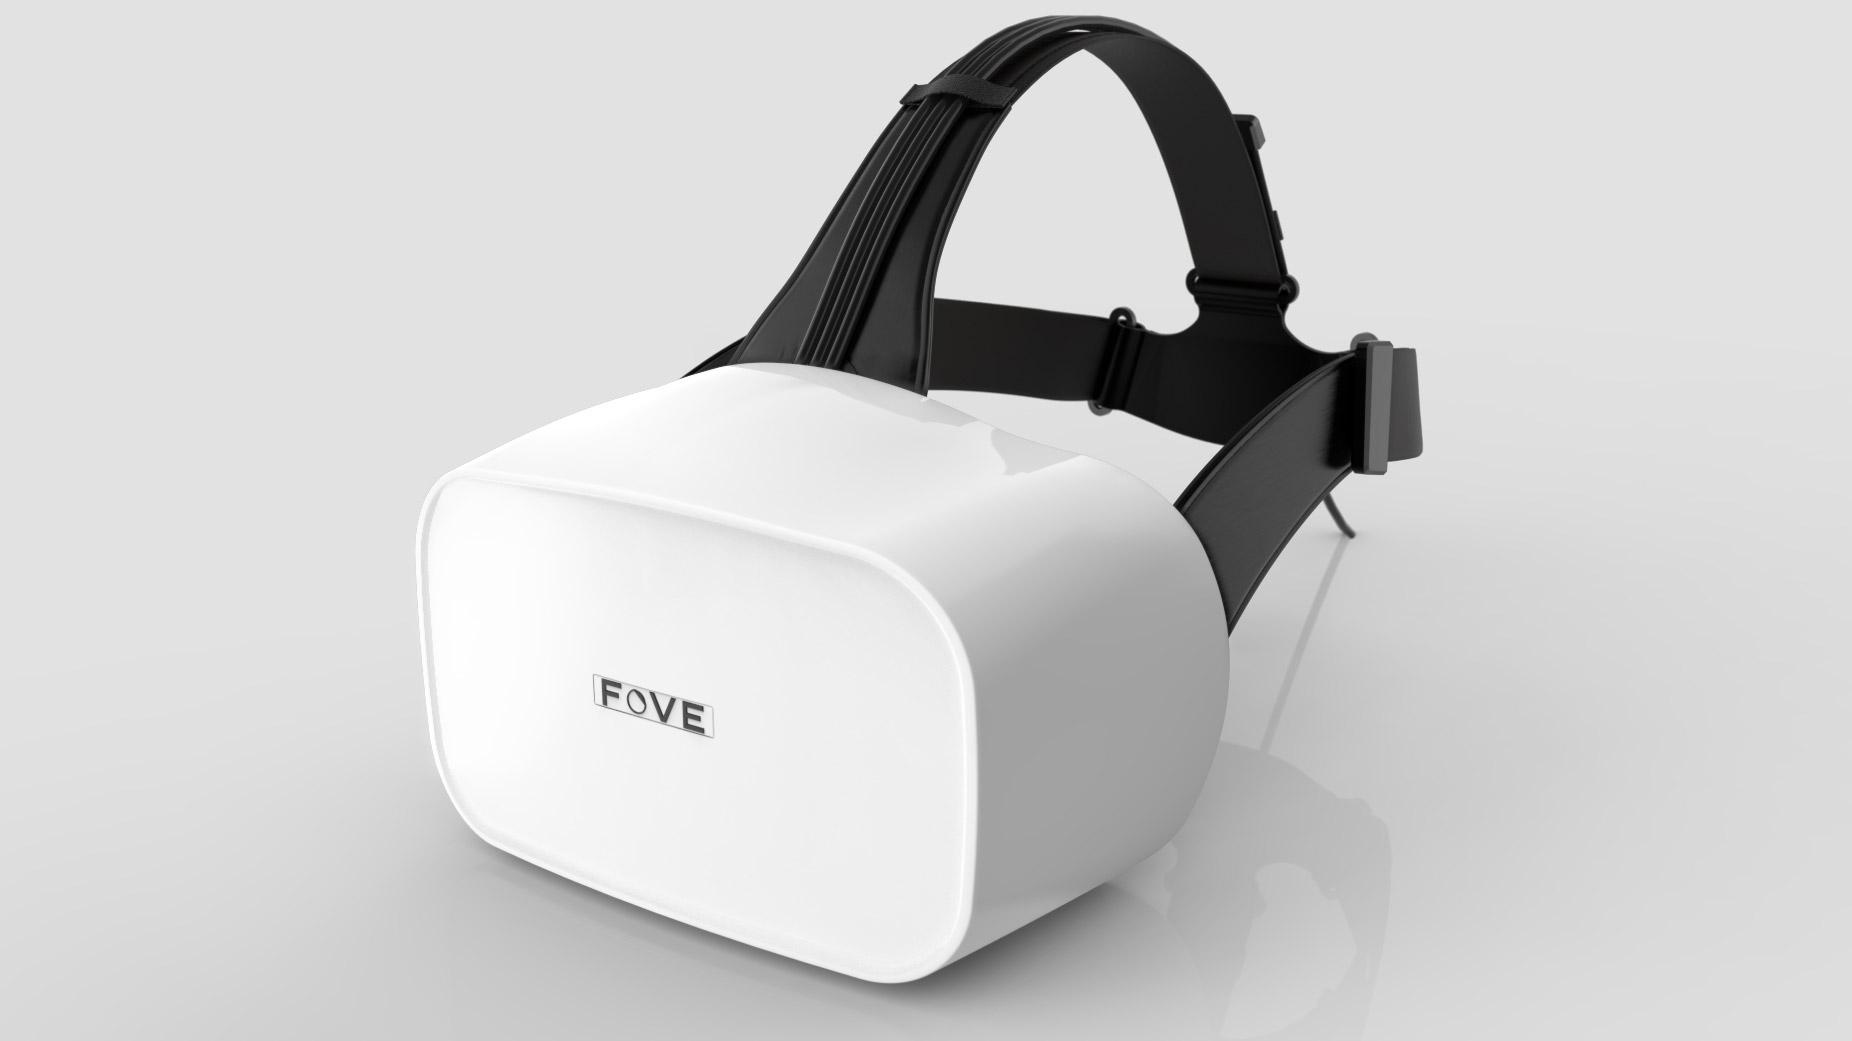 fove-0-vr-headset-2